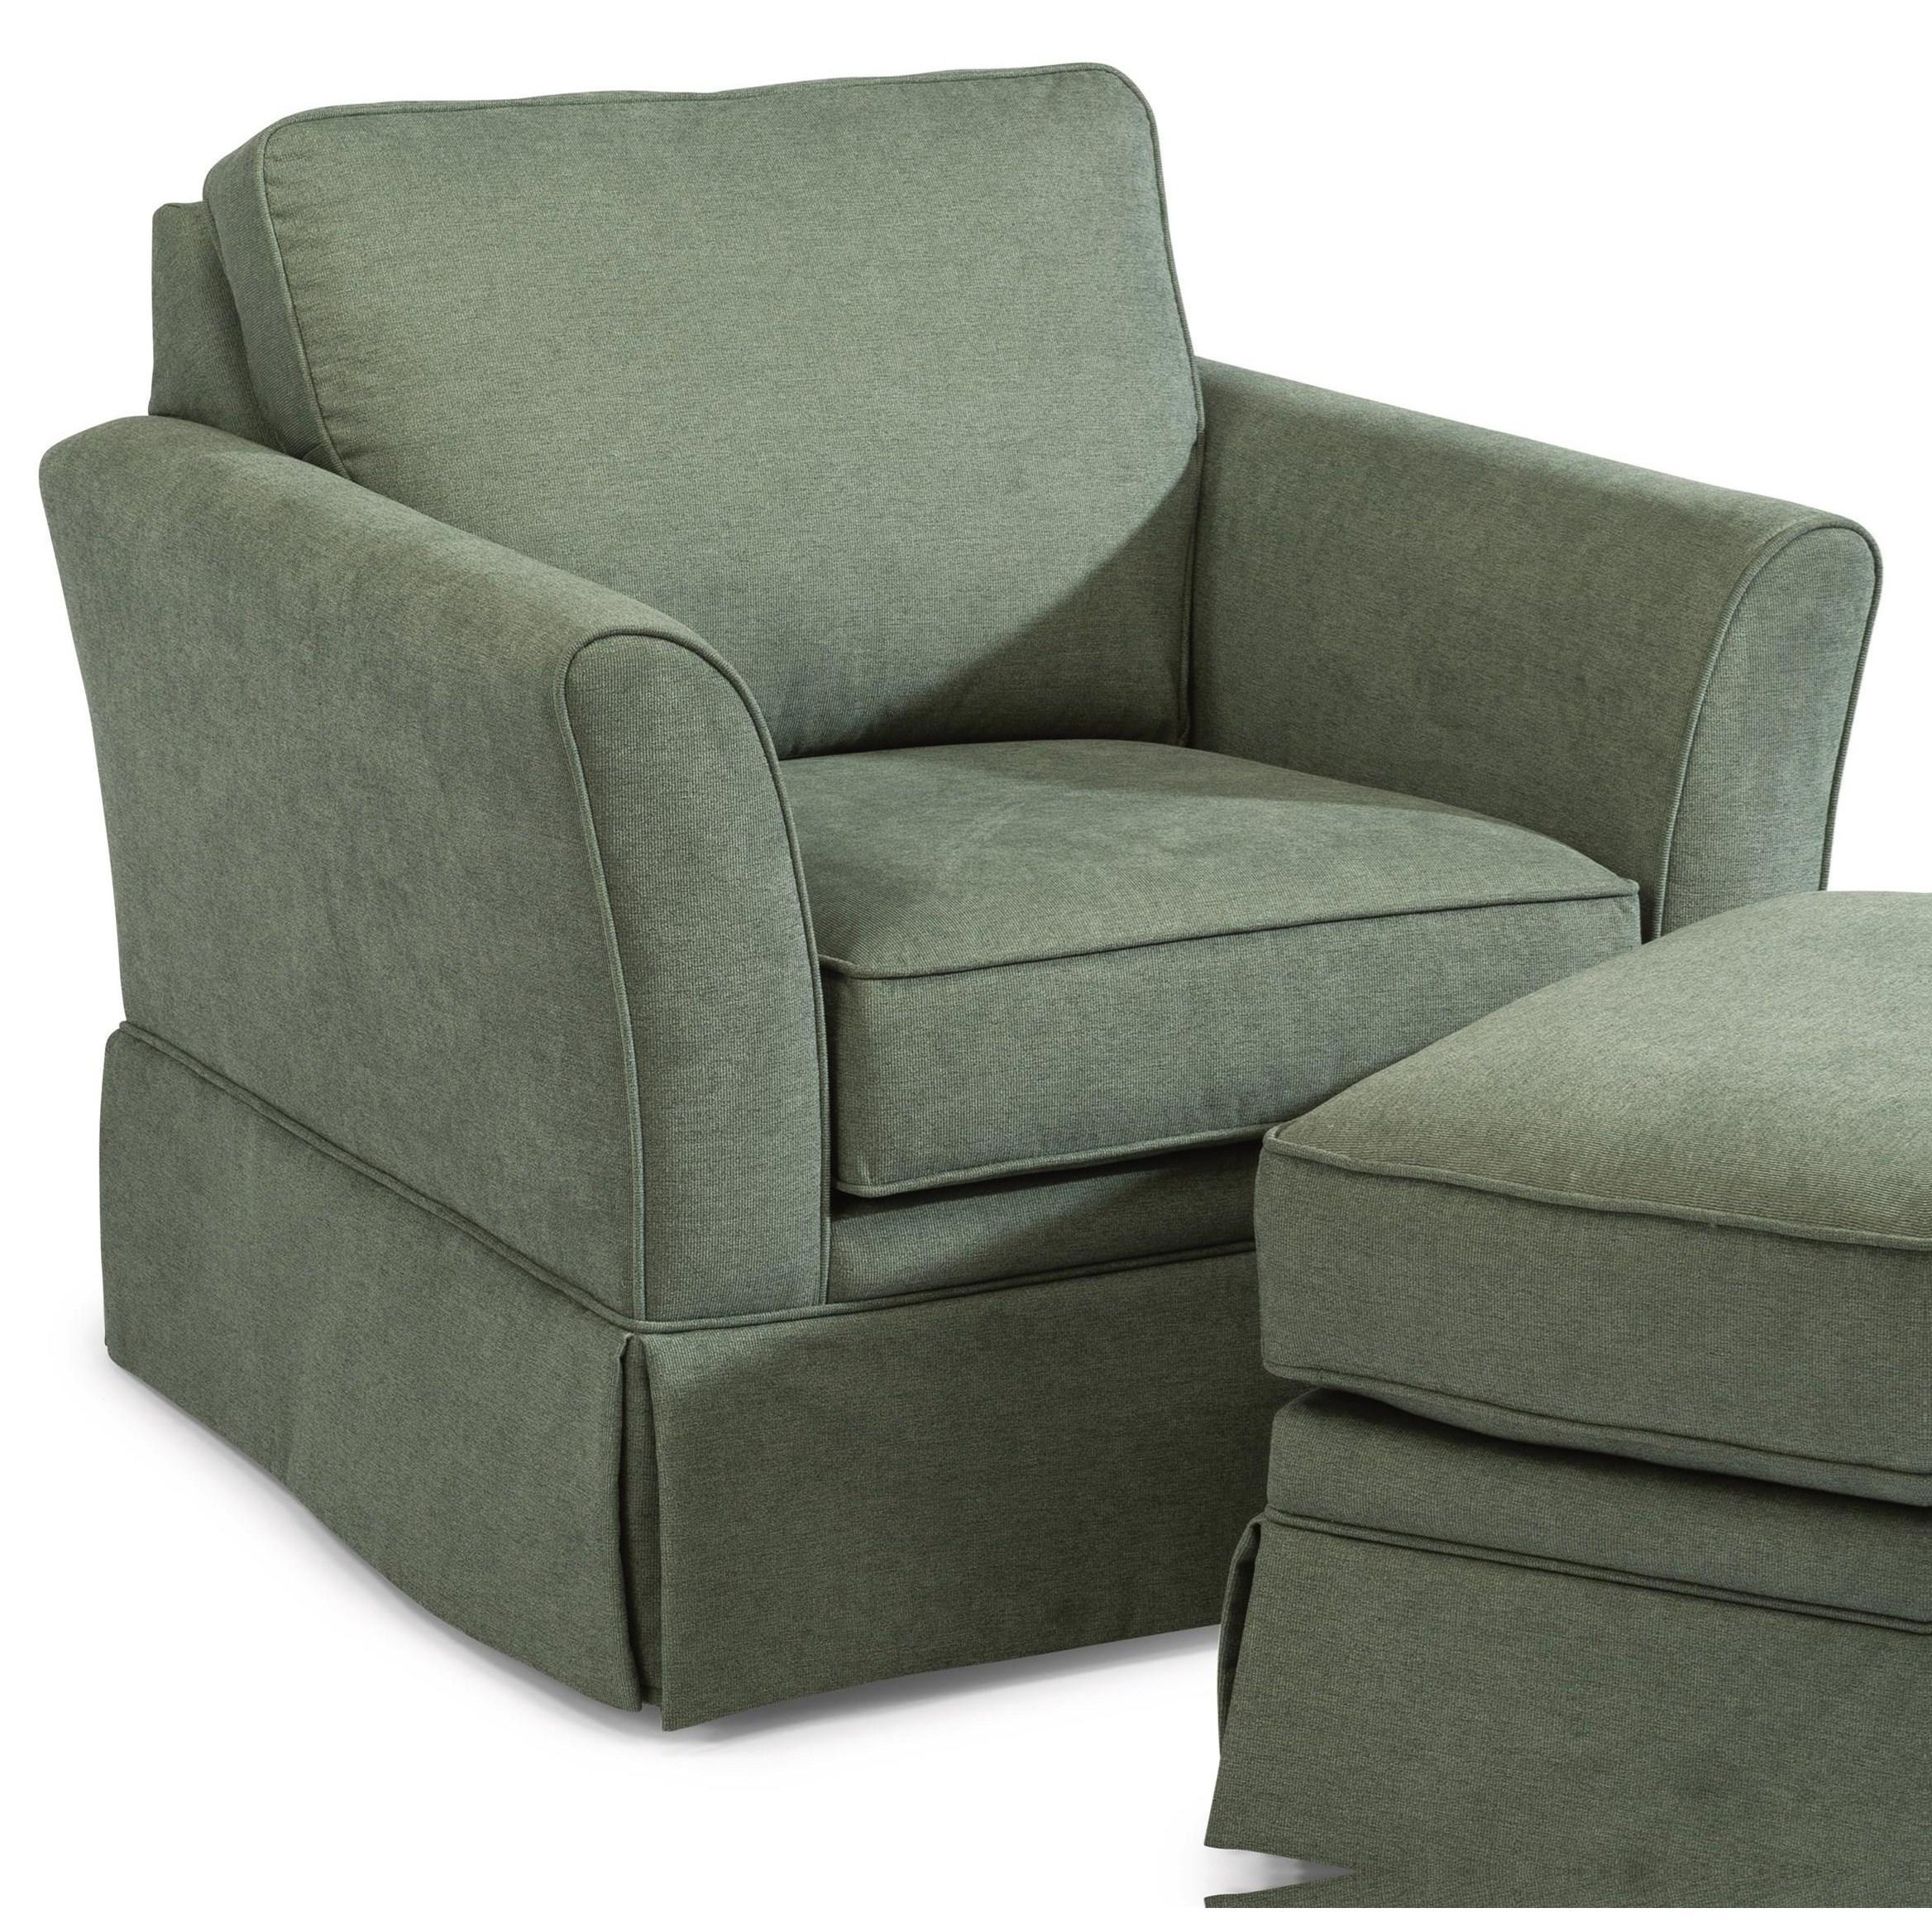 Fiona Chair  by Flexsteel at Jordan's Home Furnishings